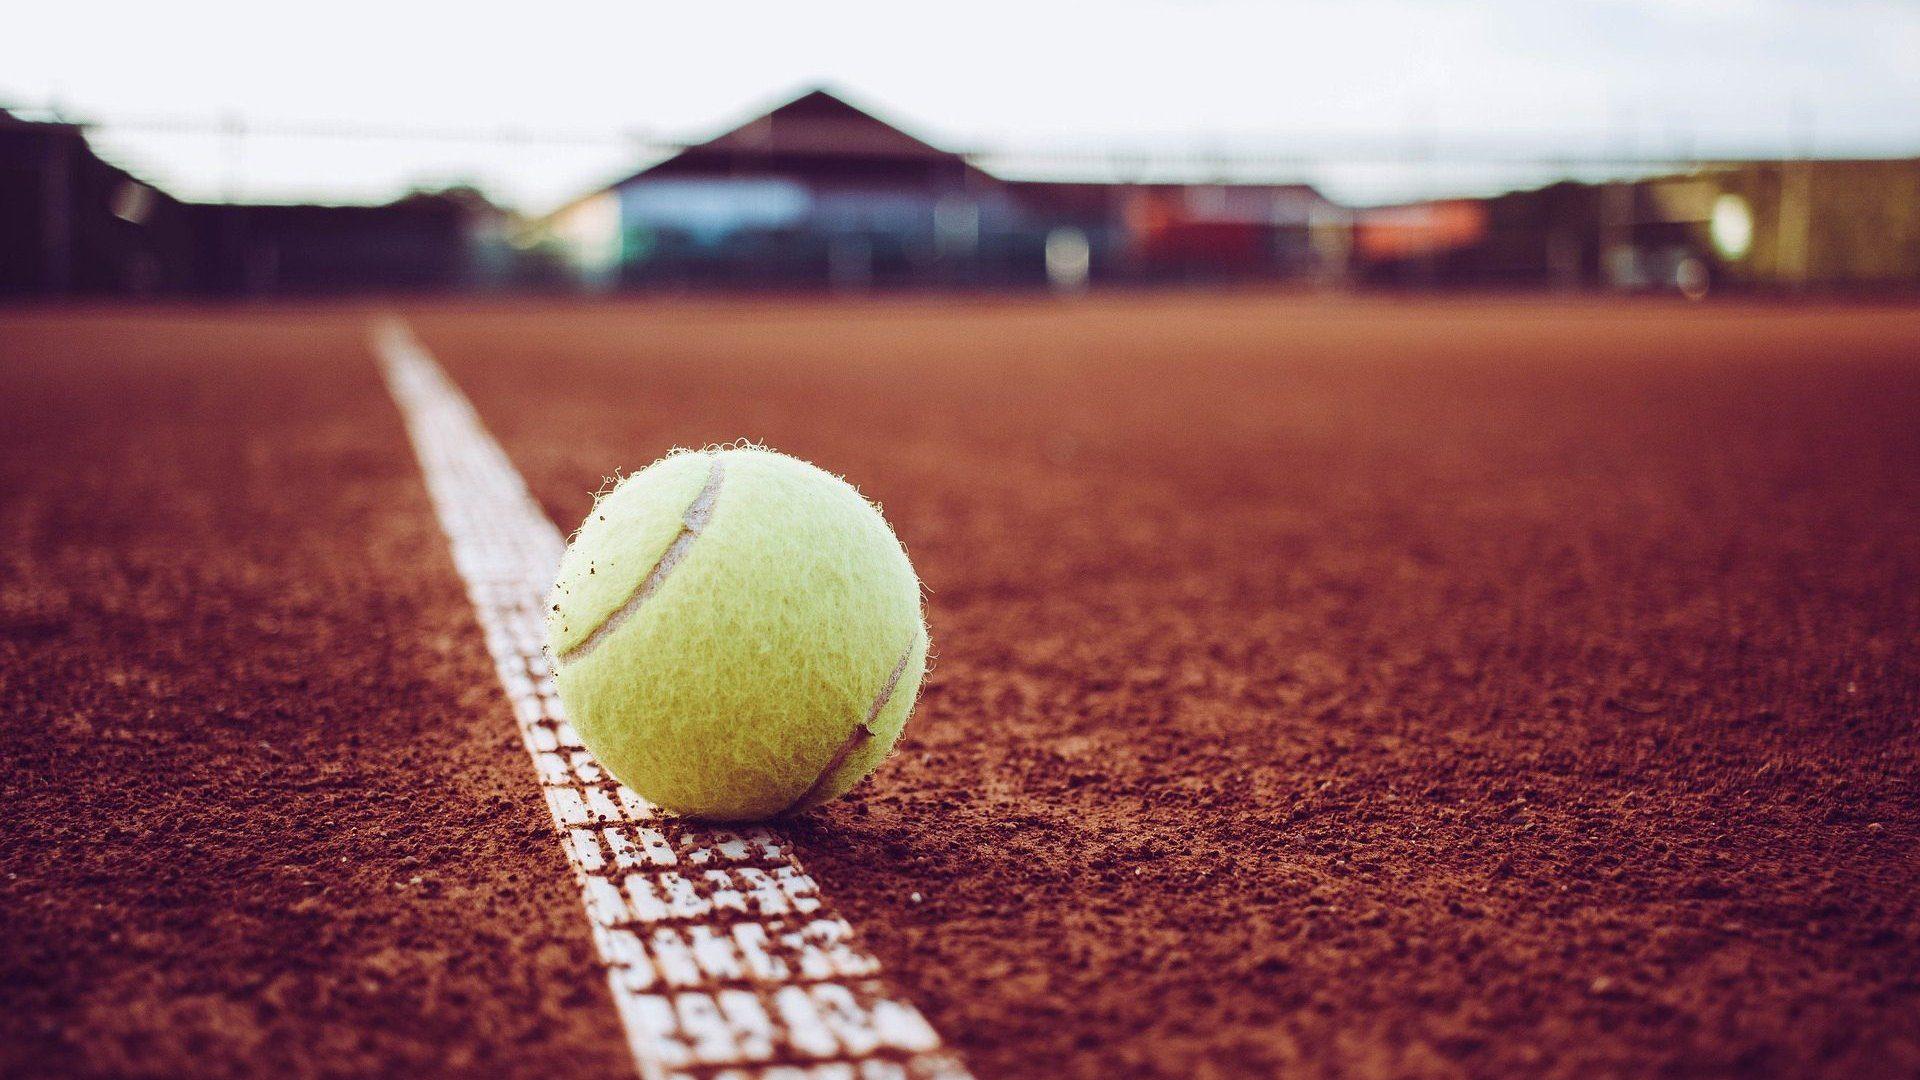 Aga Tenis Apartments - tło obrazu